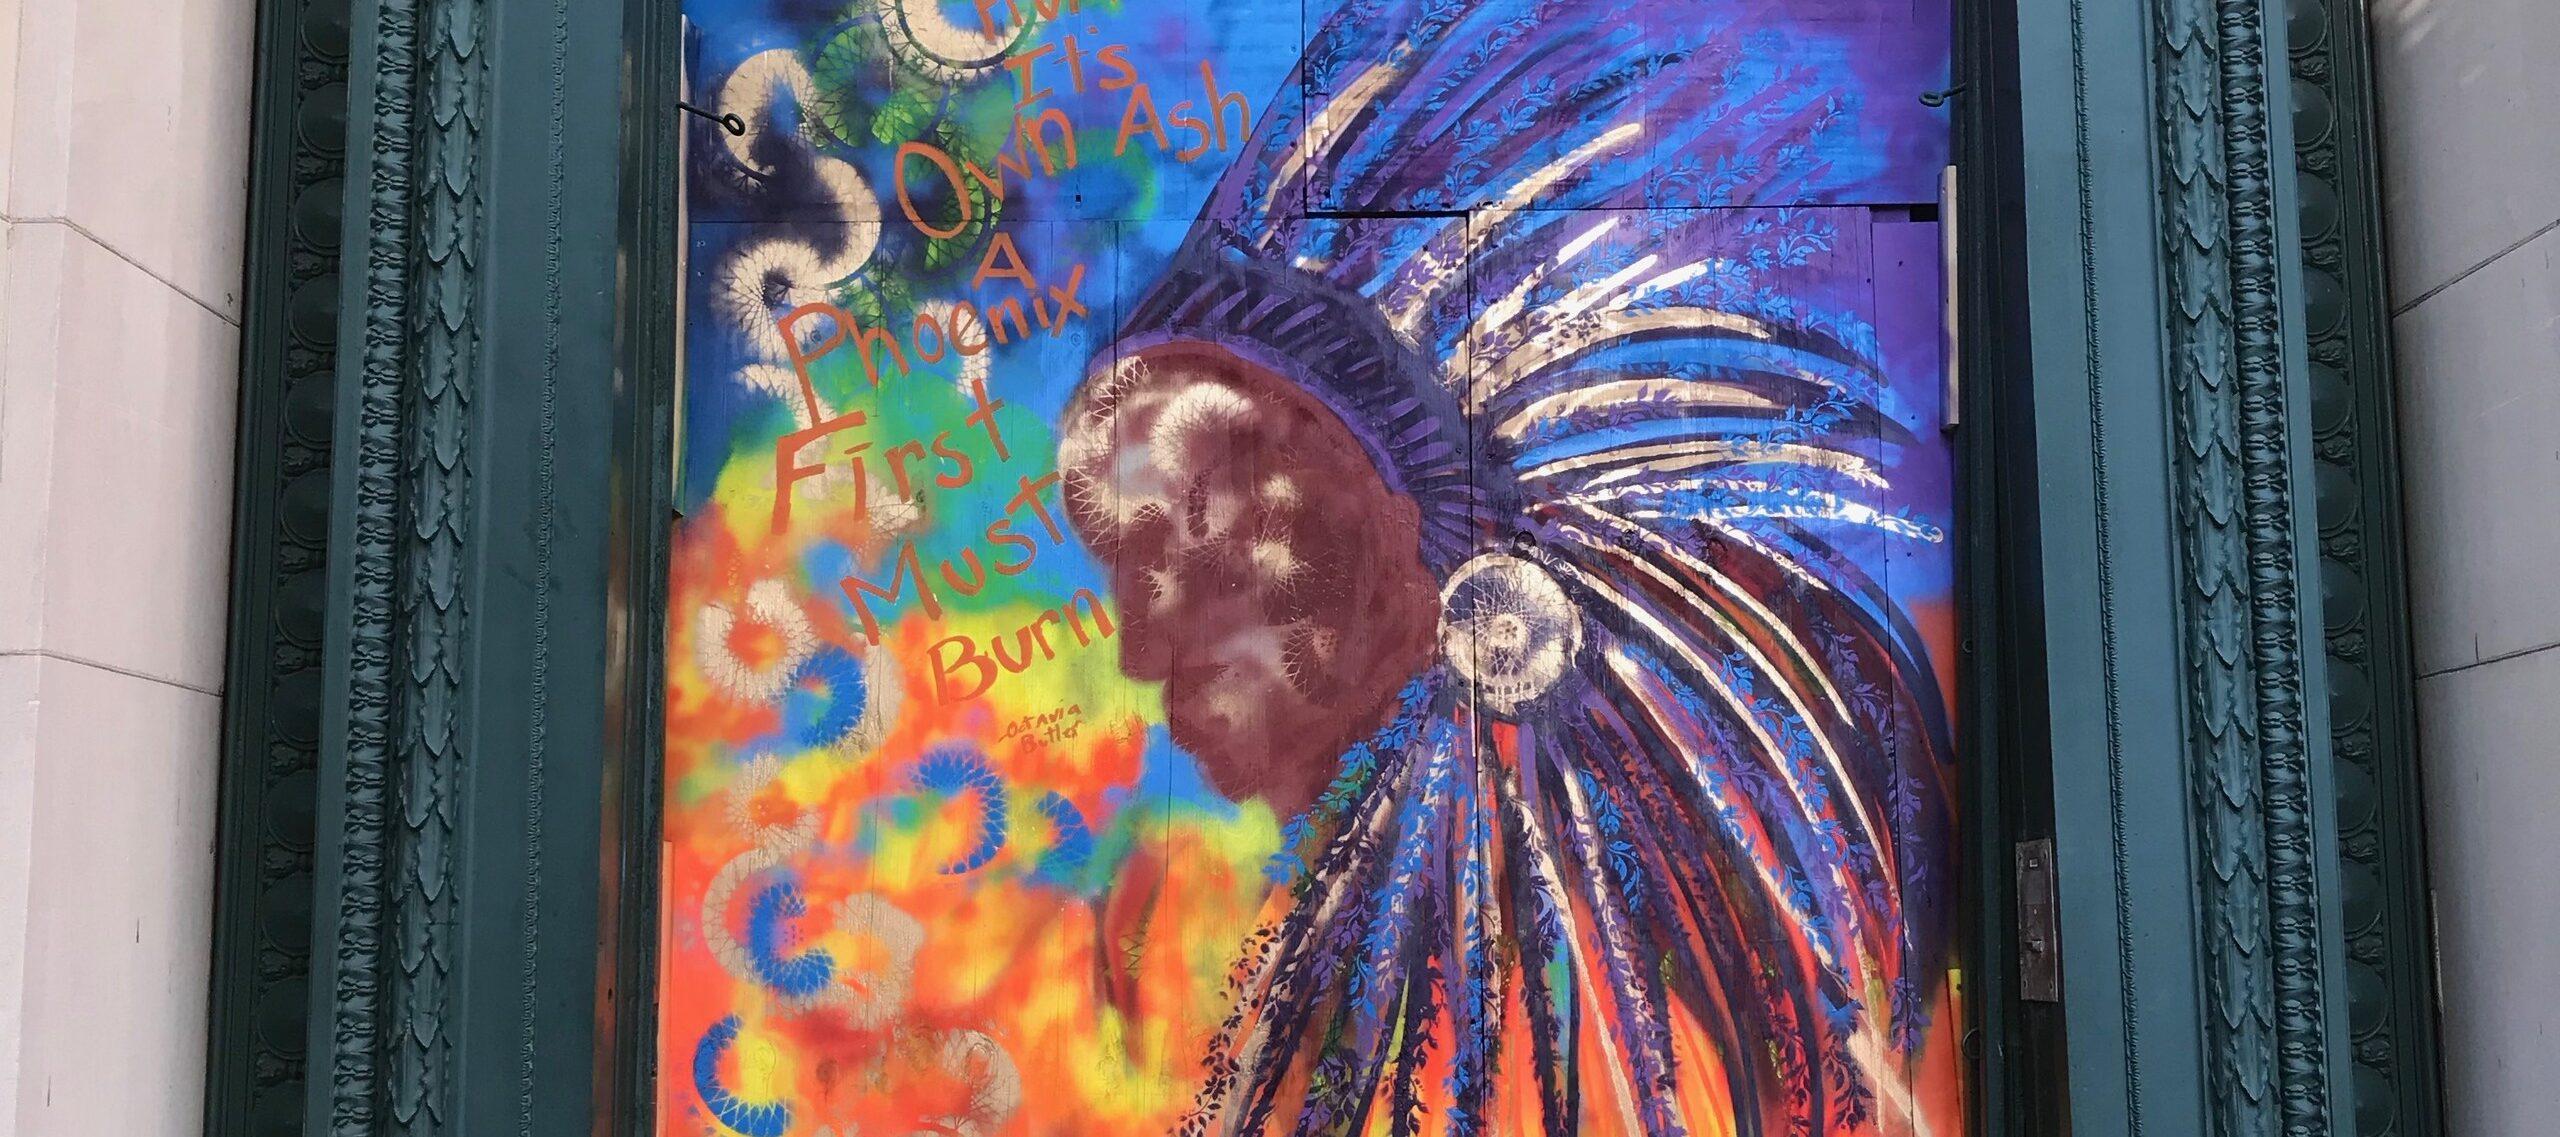 NMWA mural by Quest Skinner; Photo by Mara Kurlandsky